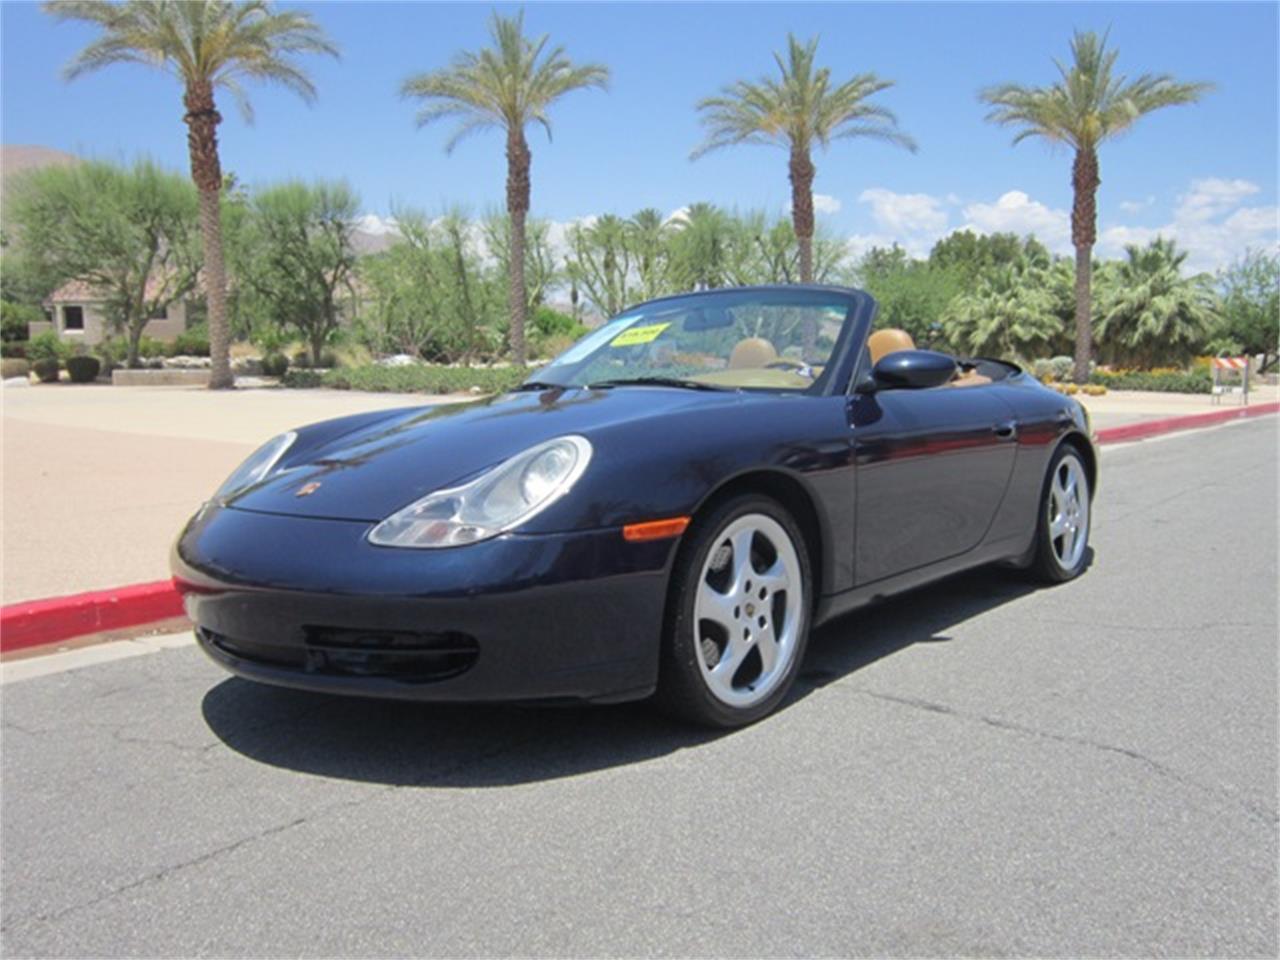 2000 Porsche 911 Carrera (CC-1274089) for sale in Palm Springs, California